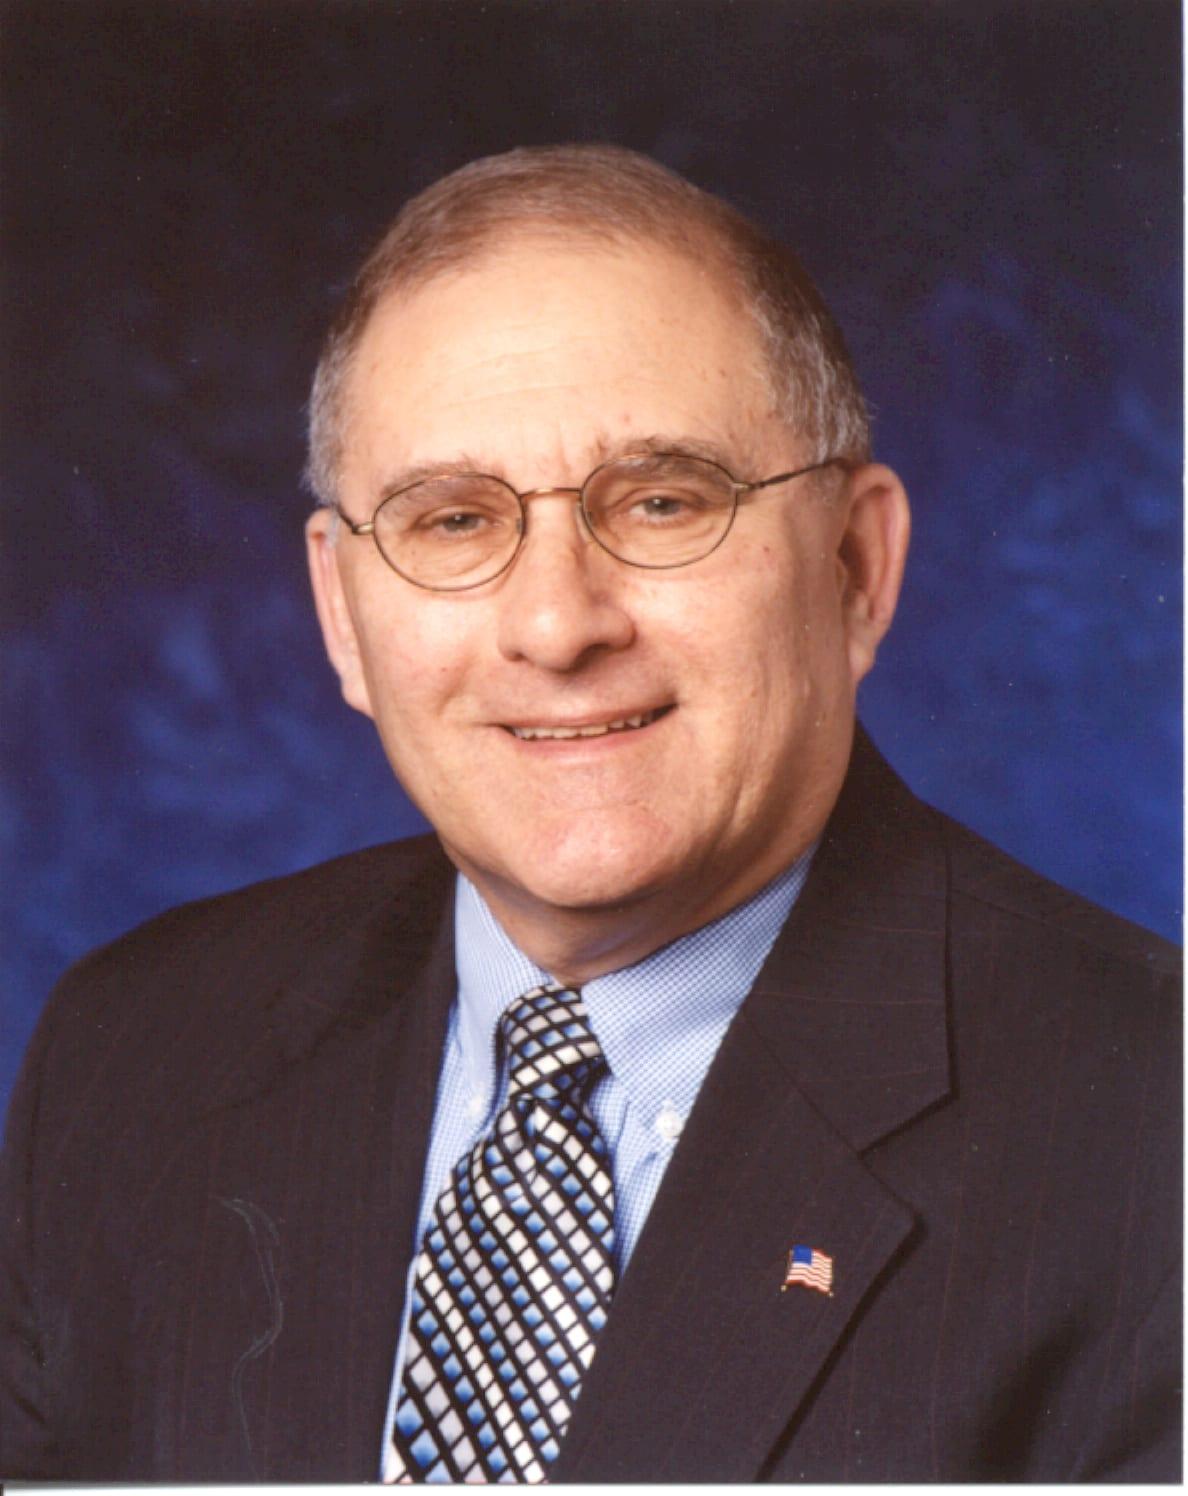 Robert Freedman